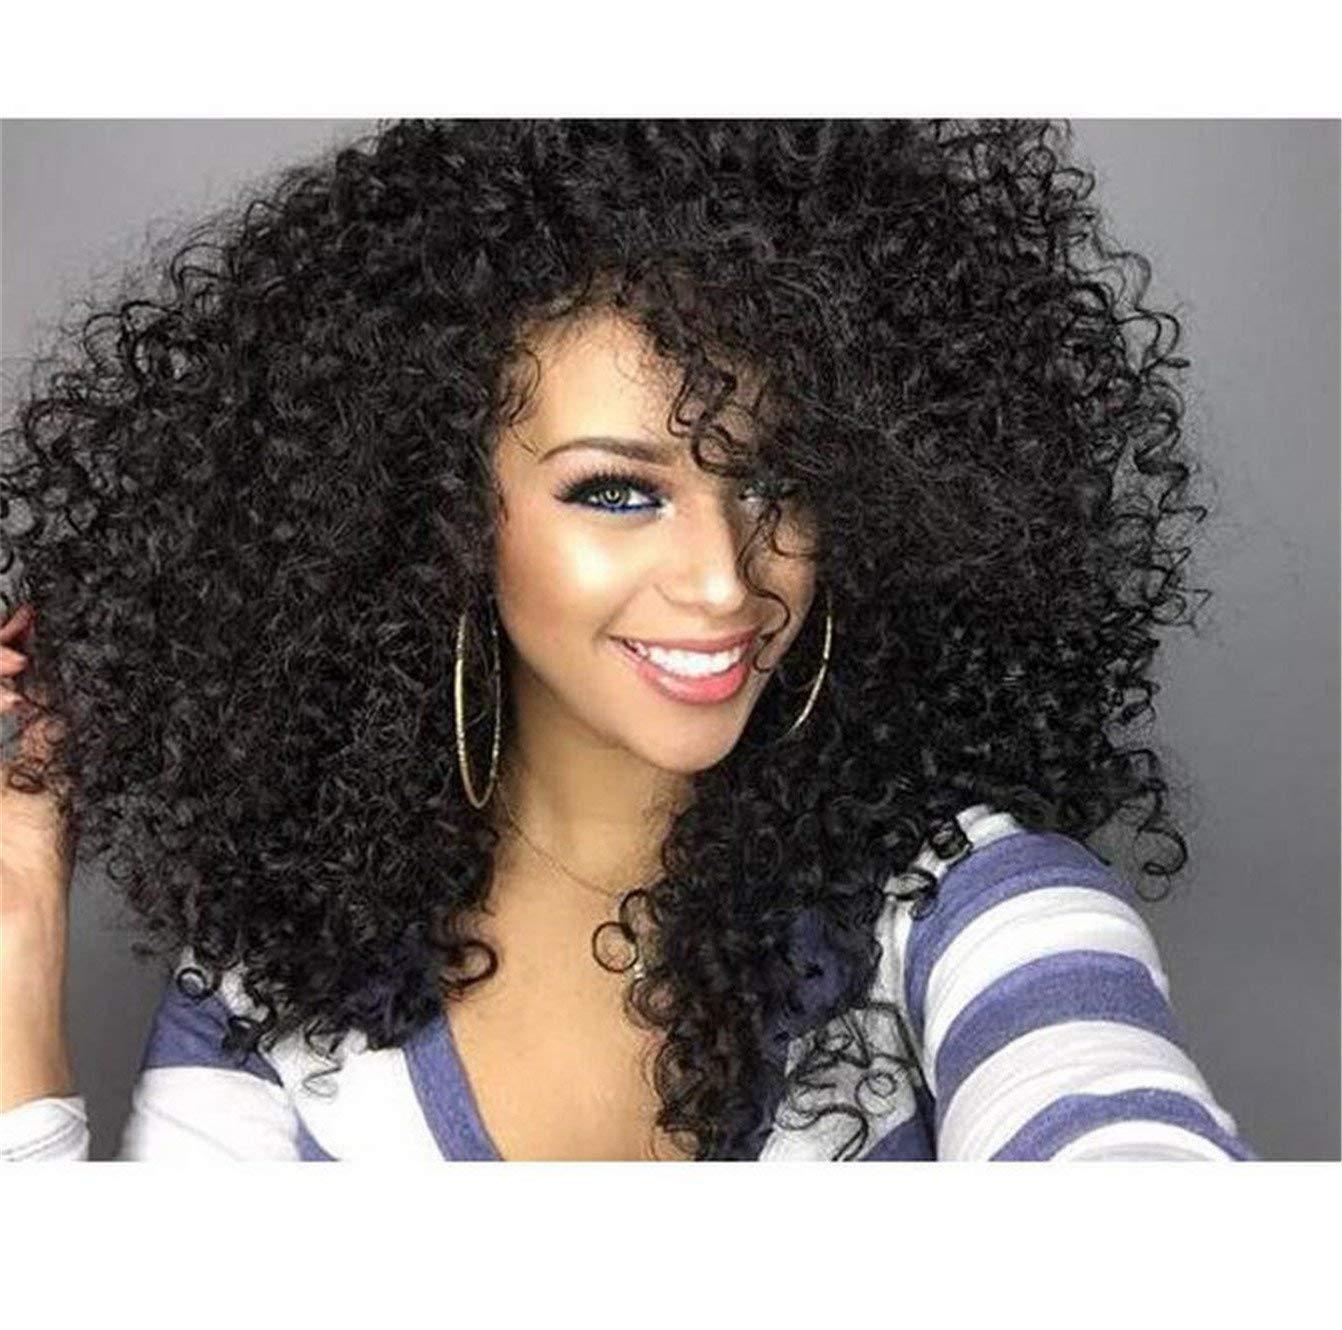 Cool2day - peluca afro ensortijada de cabello sintético, largo, rizado. Pelucas ensortijadas, baratas para mujeres negras, peluca femenina afroamericana de ...